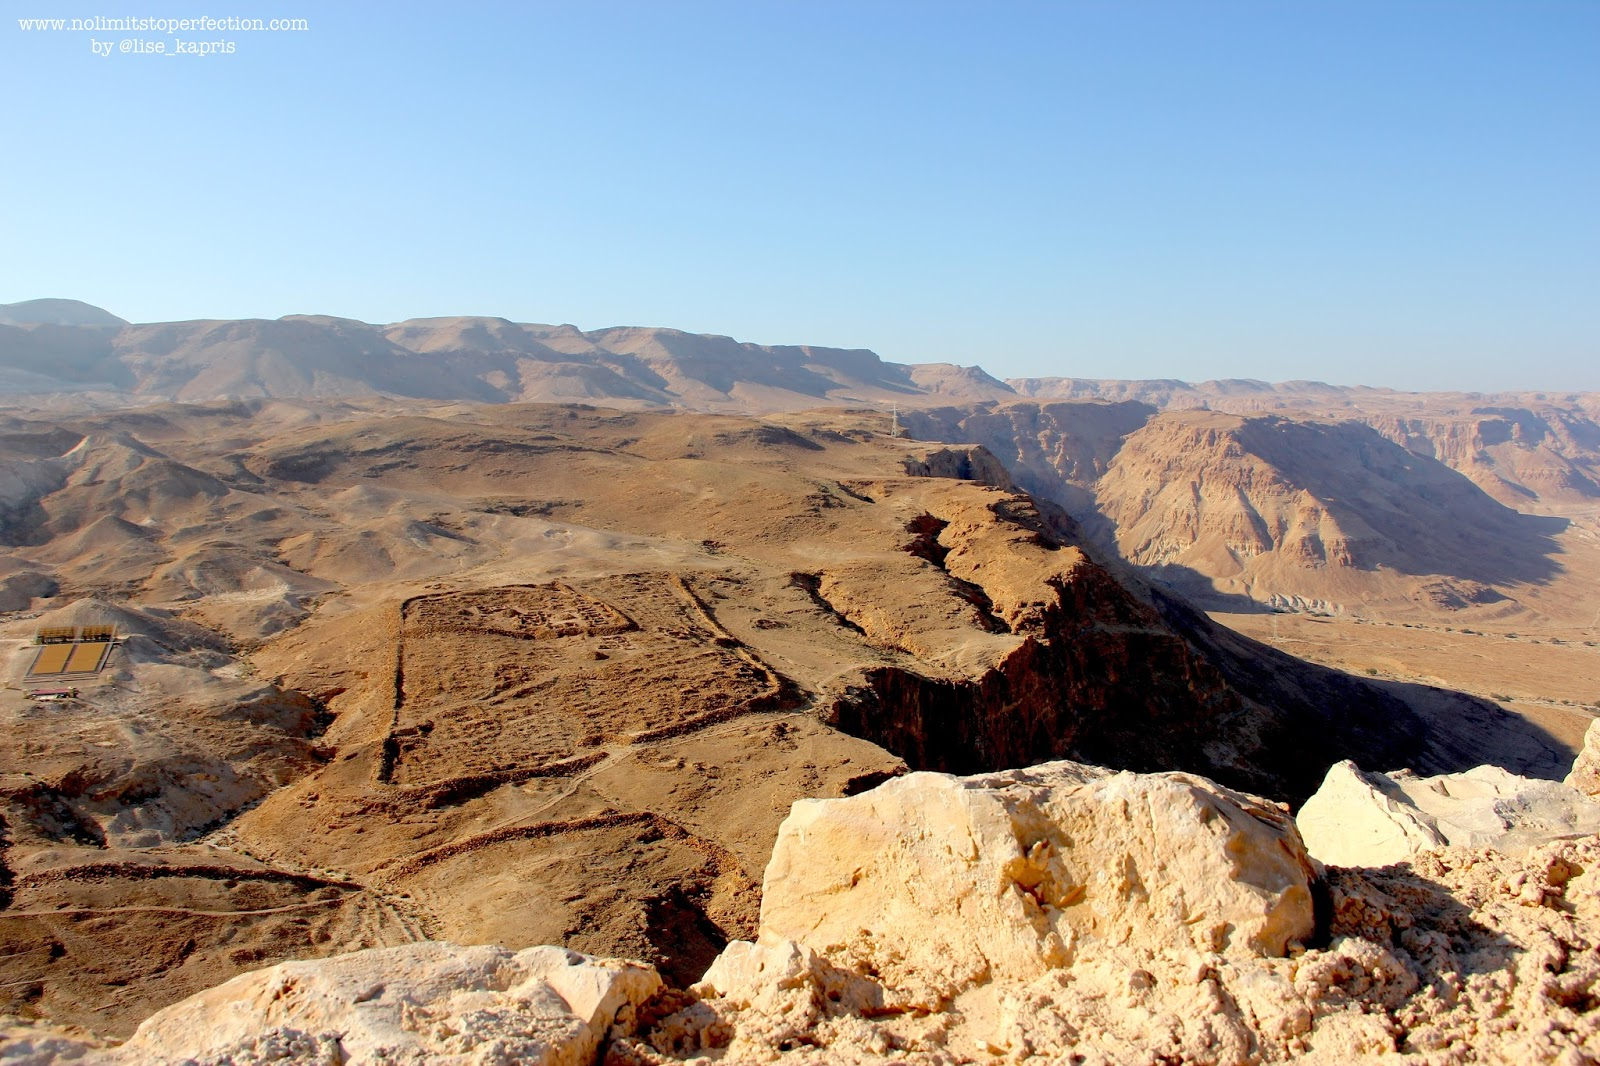 Лис Каприс в Израиле